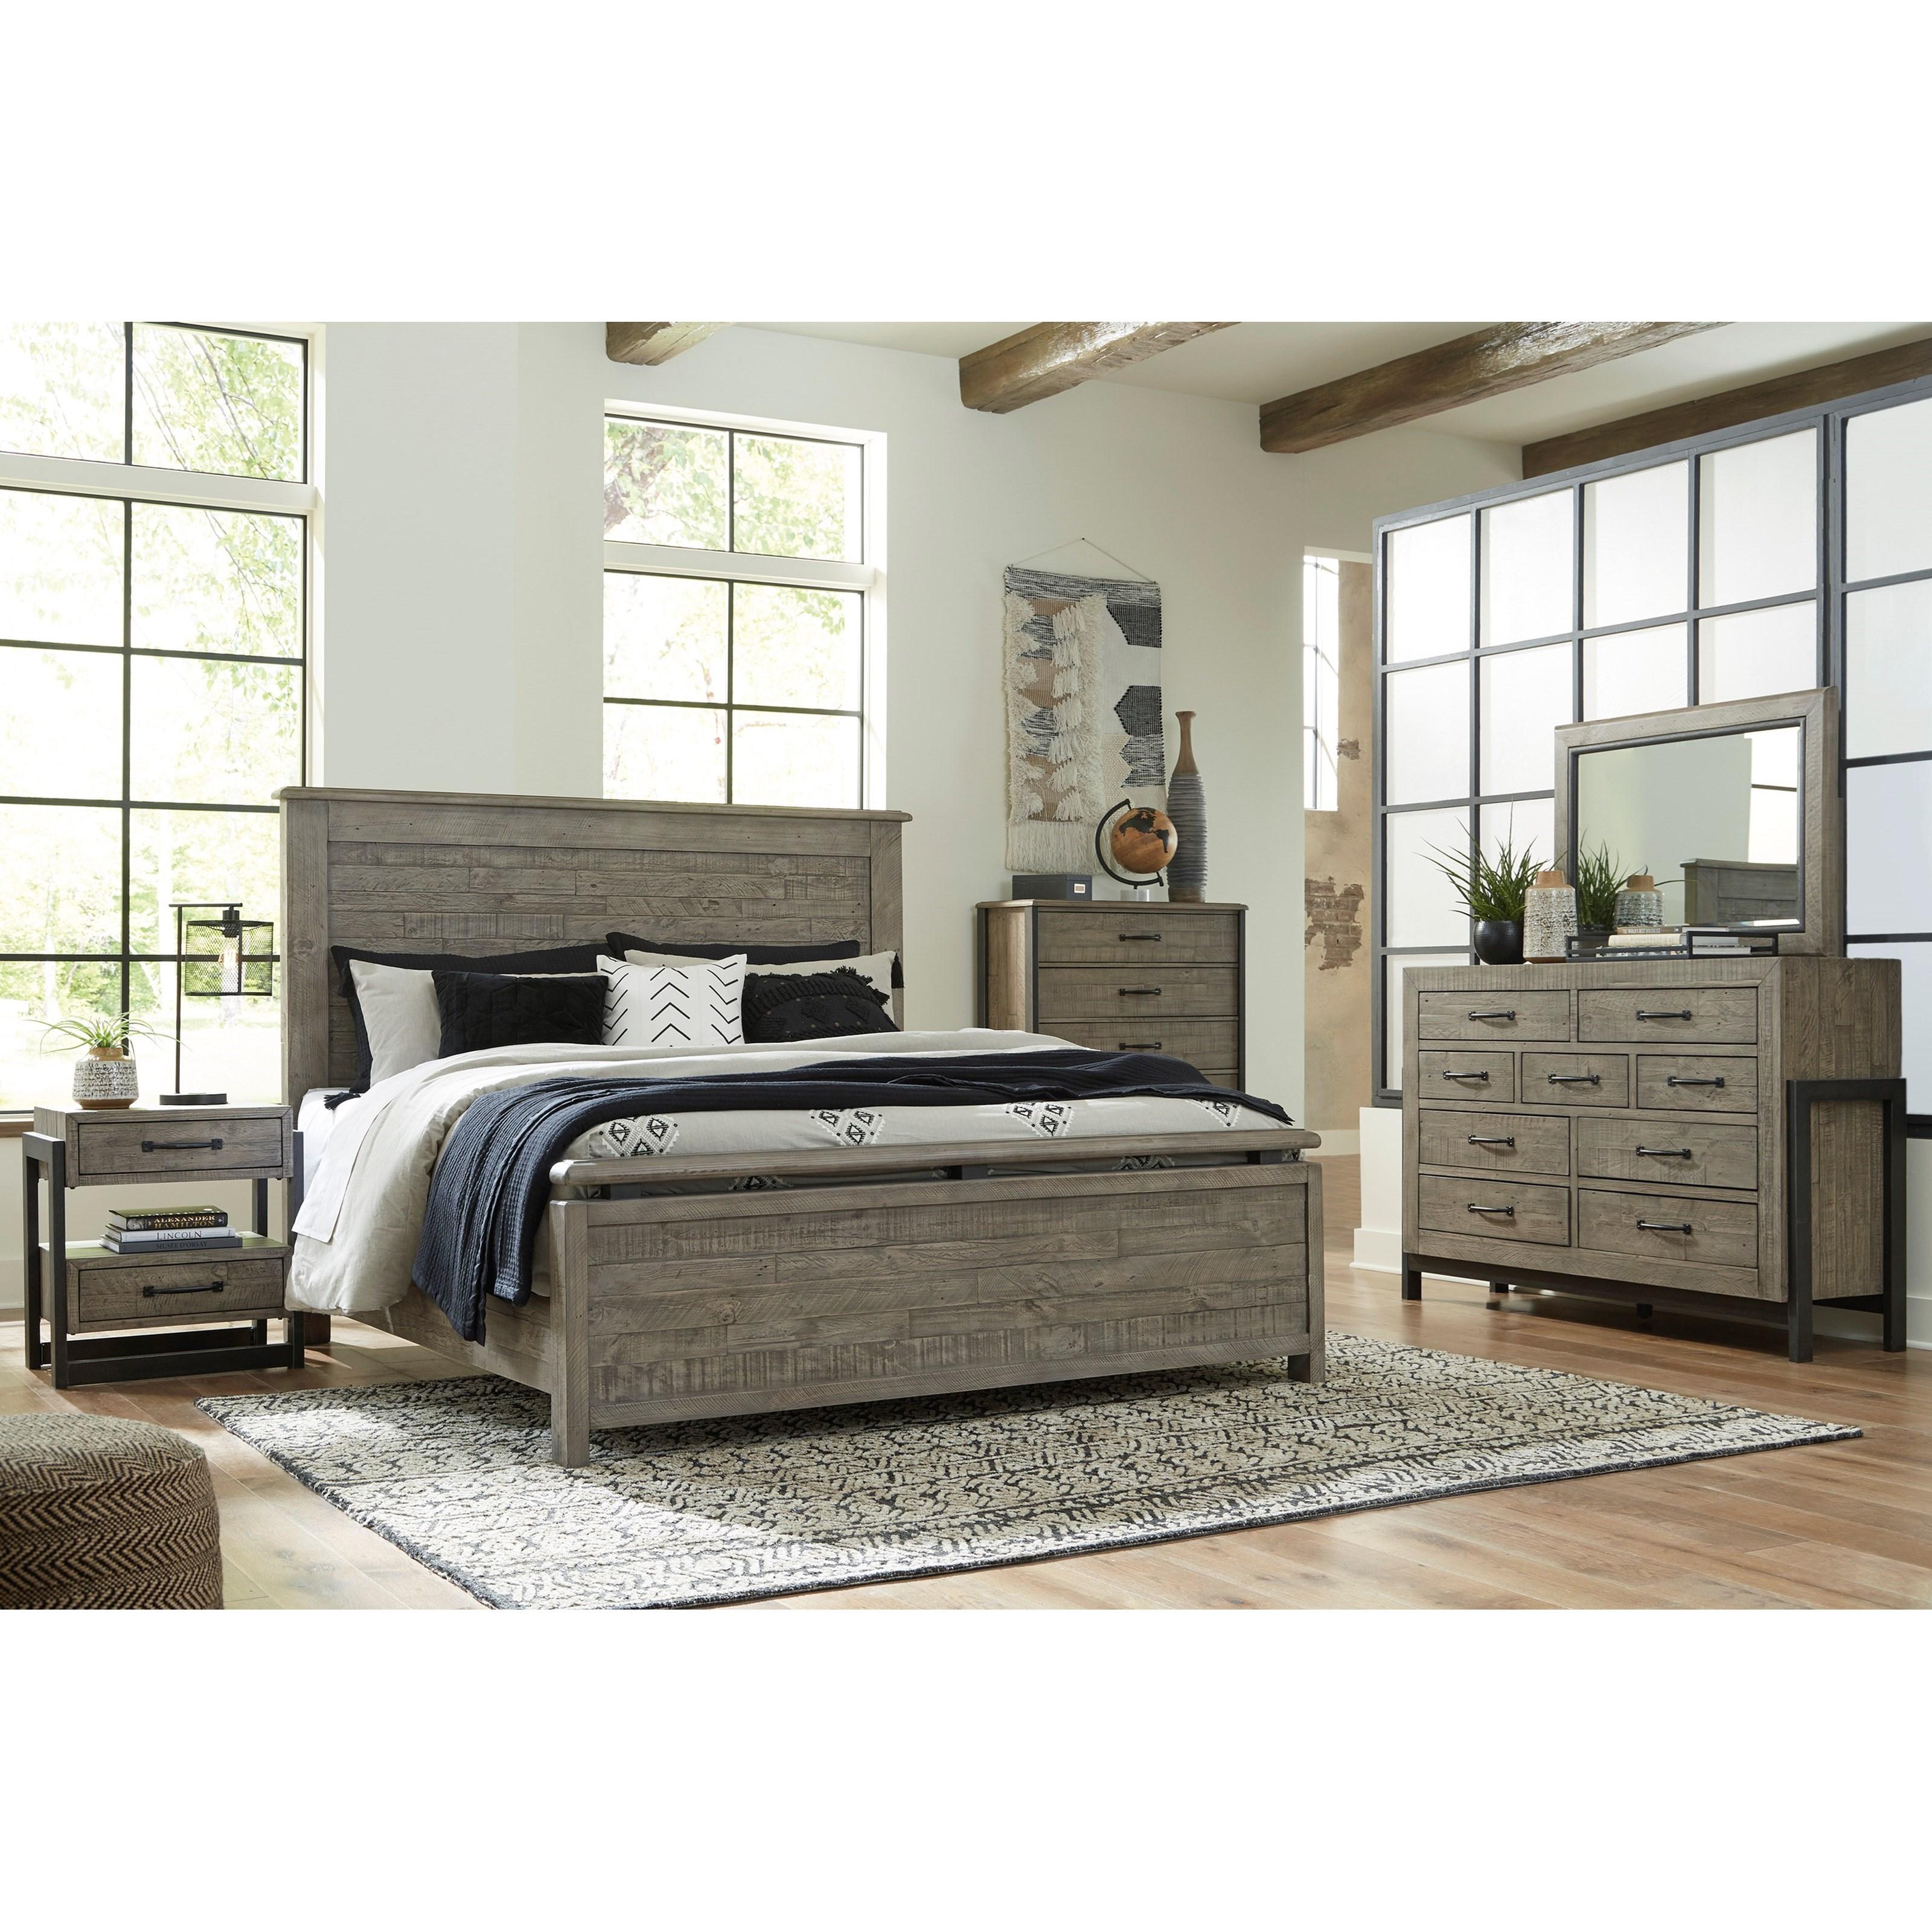 Brennagan California King Bedroom Group by Ashley (Signature Design) at Johnny Janosik